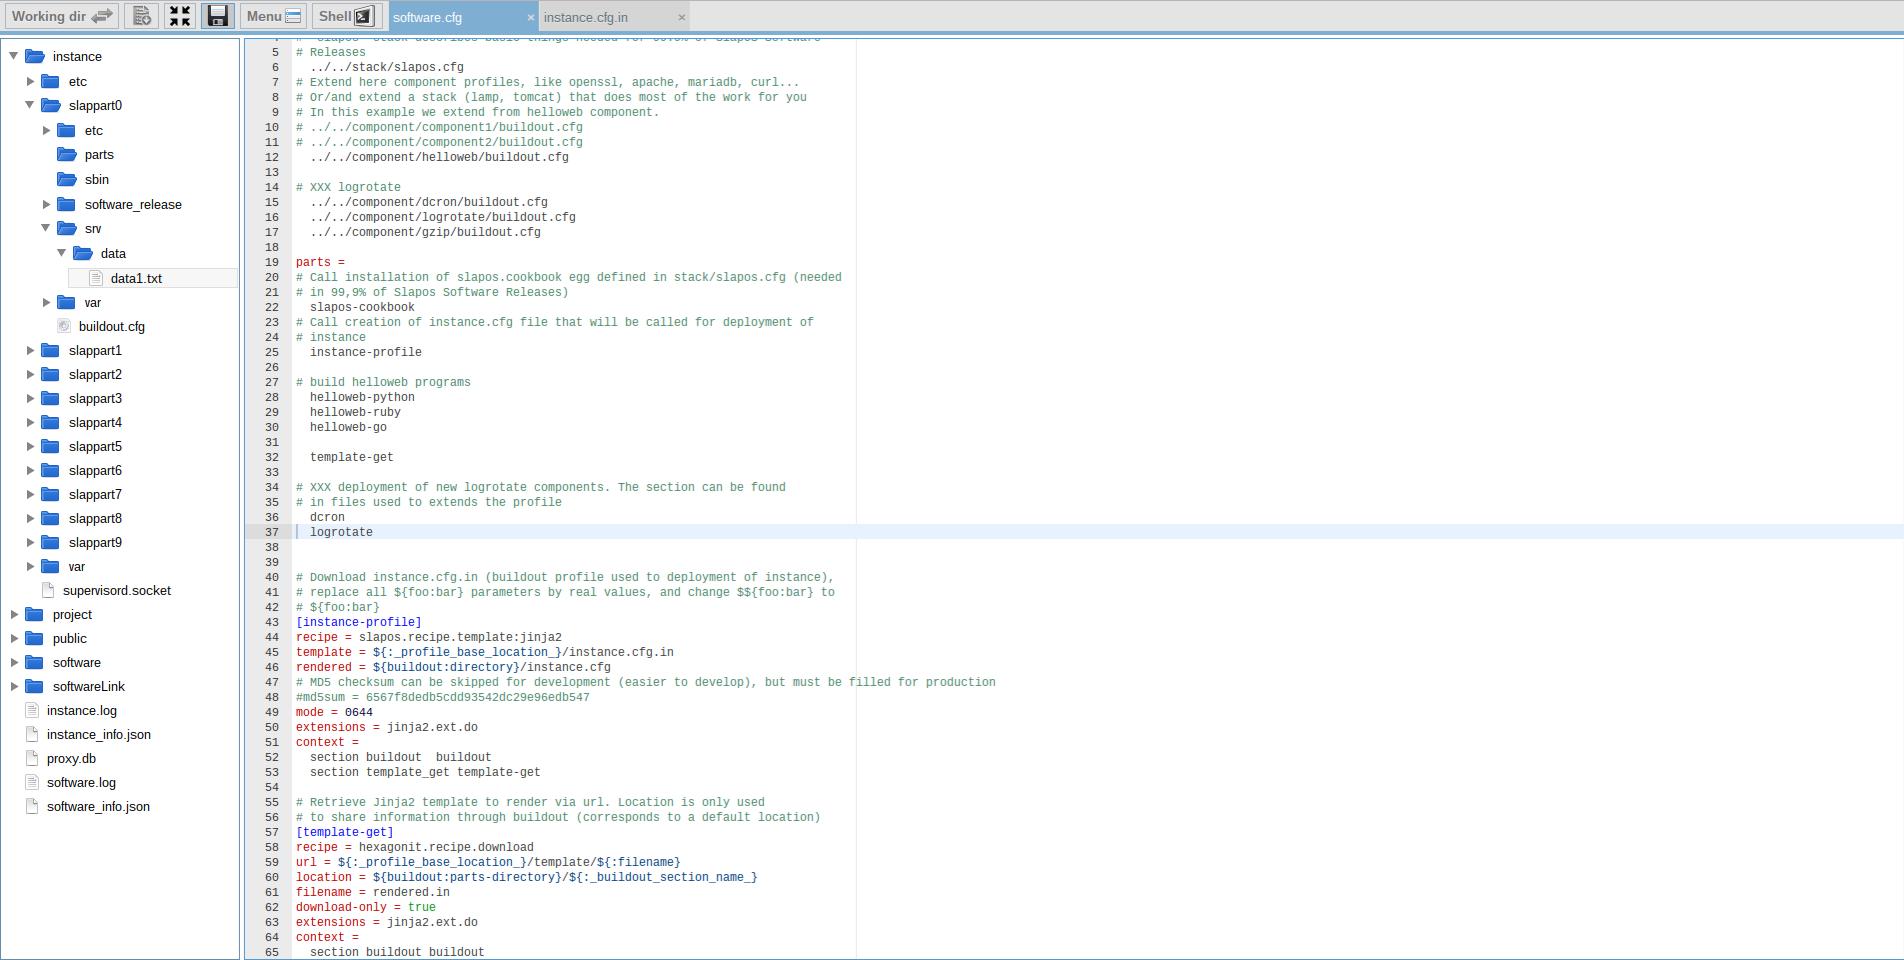 Extending Software Release - Webrunner Interface - Add Logrotate to Software Profile